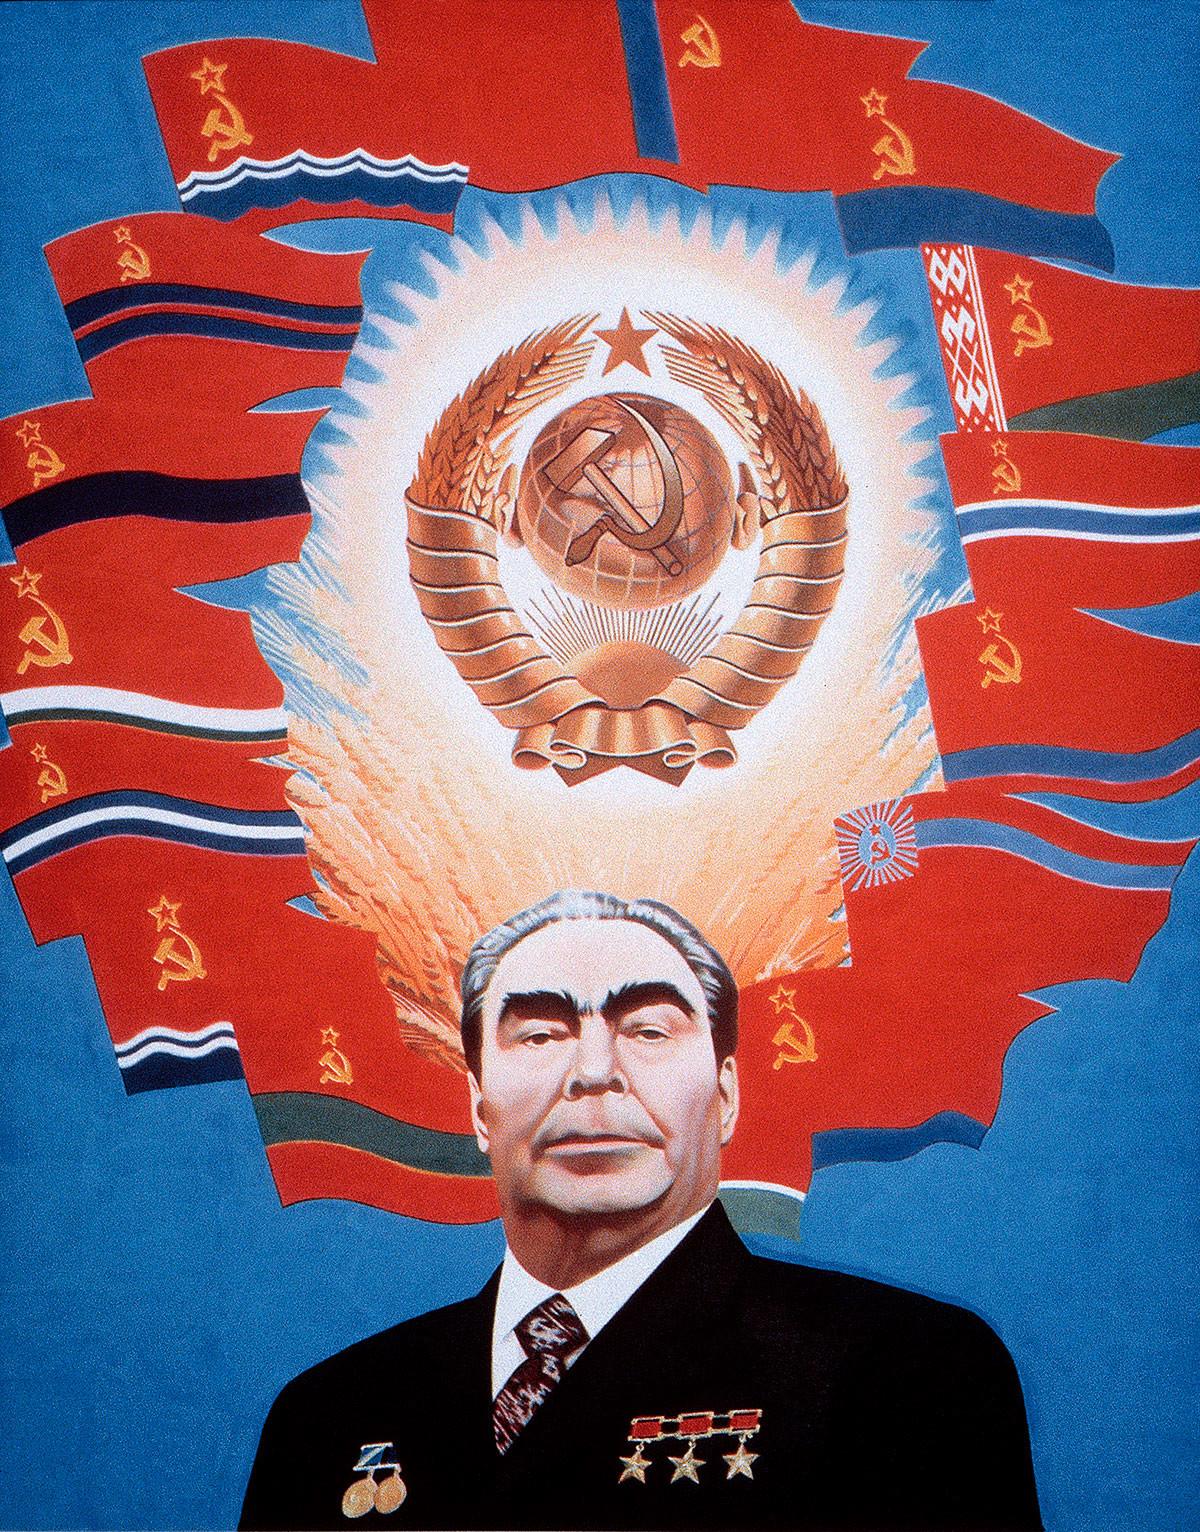 Eric Bulatov. Brézhnev. El espacio soviético, 1977